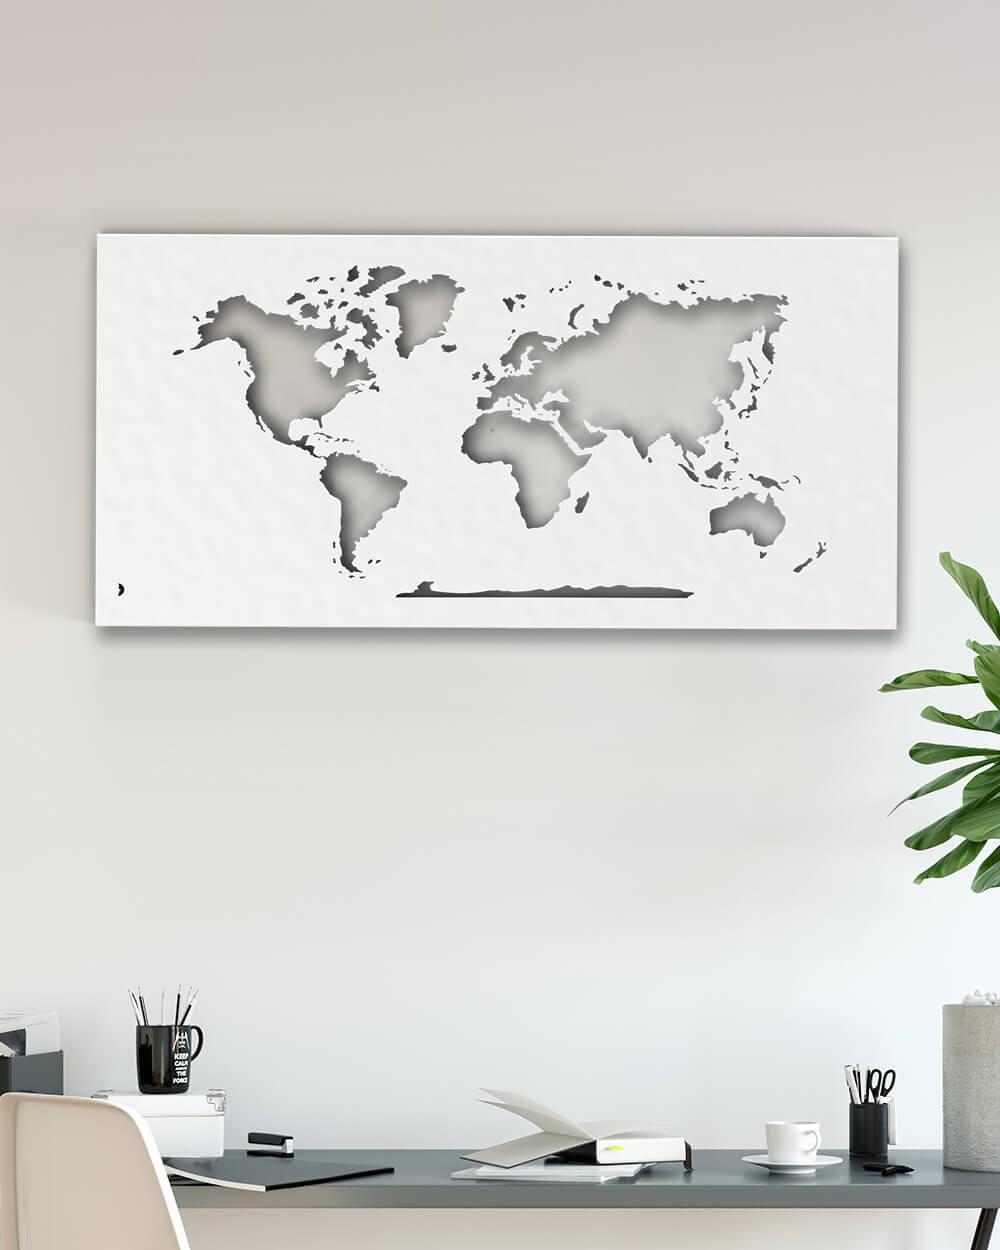 carte du monde planisph re d coration murale en m tal. Black Bedroom Furniture Sets. Home Design Ideas